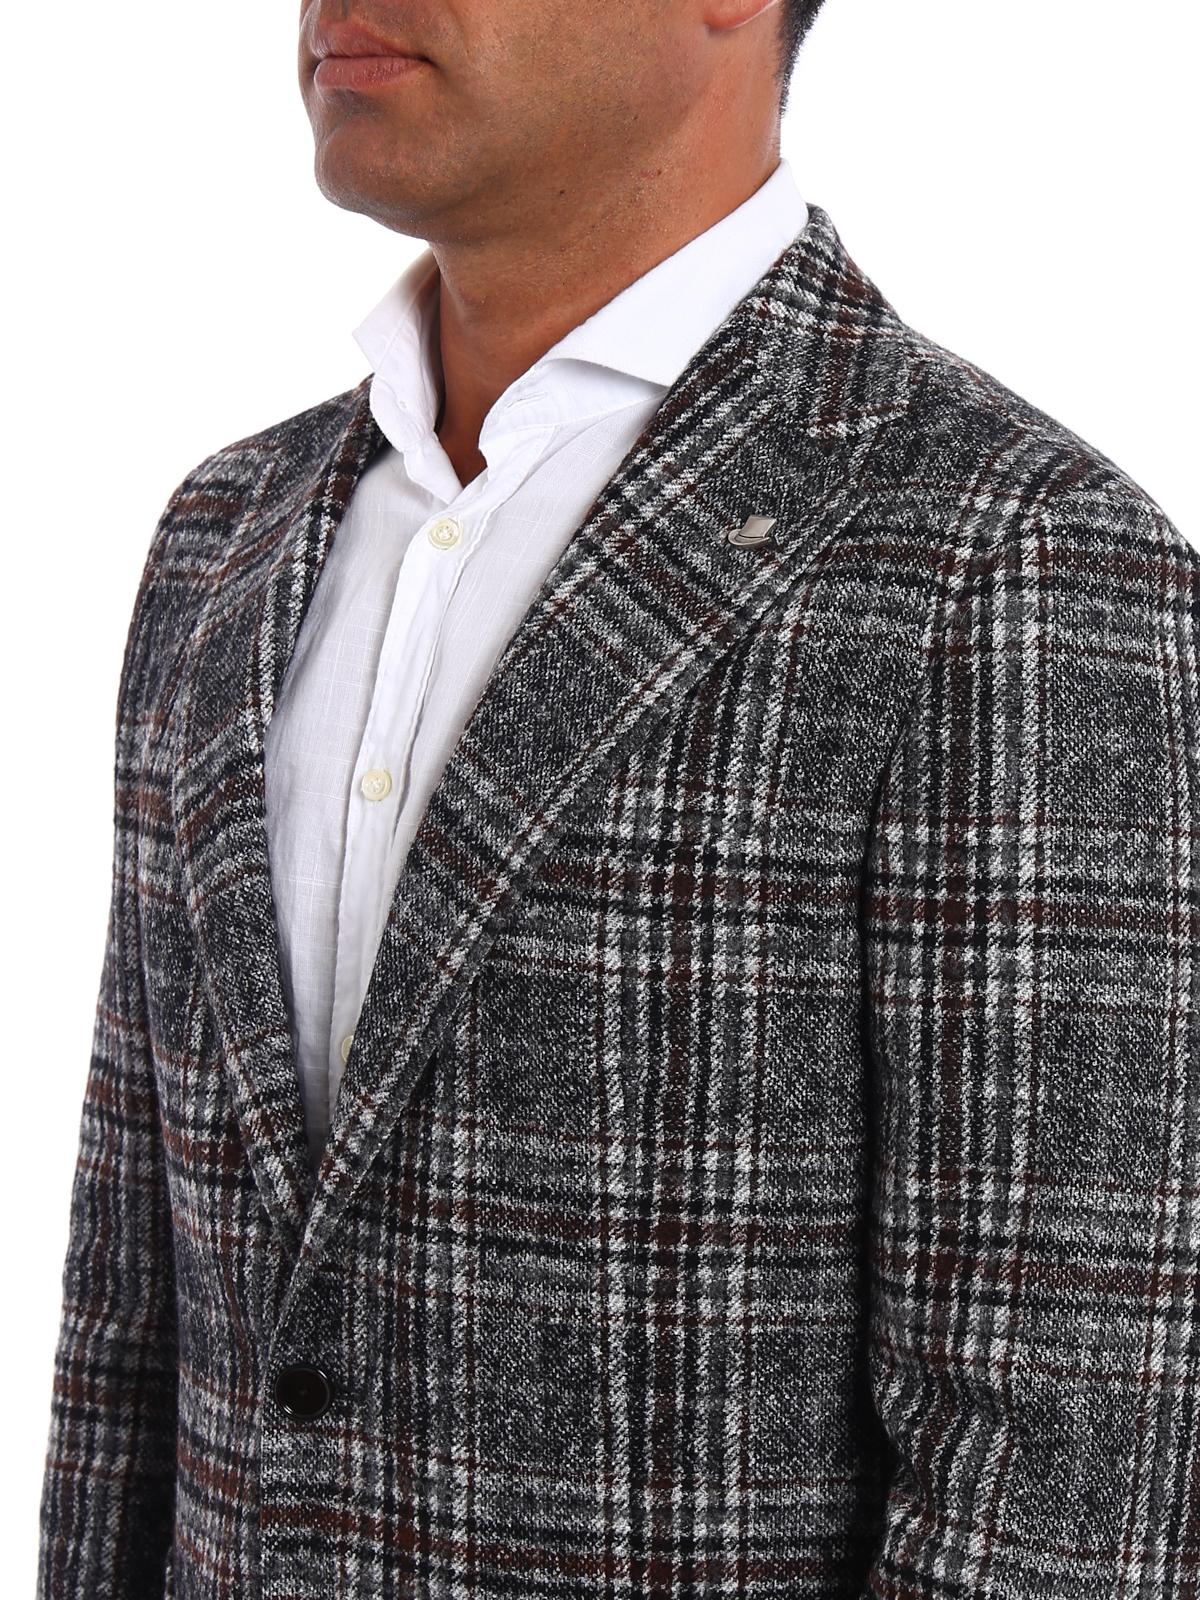 low priced 71220 ab337 Tagliatore - Giacca Galles in misto alpaca - giacche blazer ...